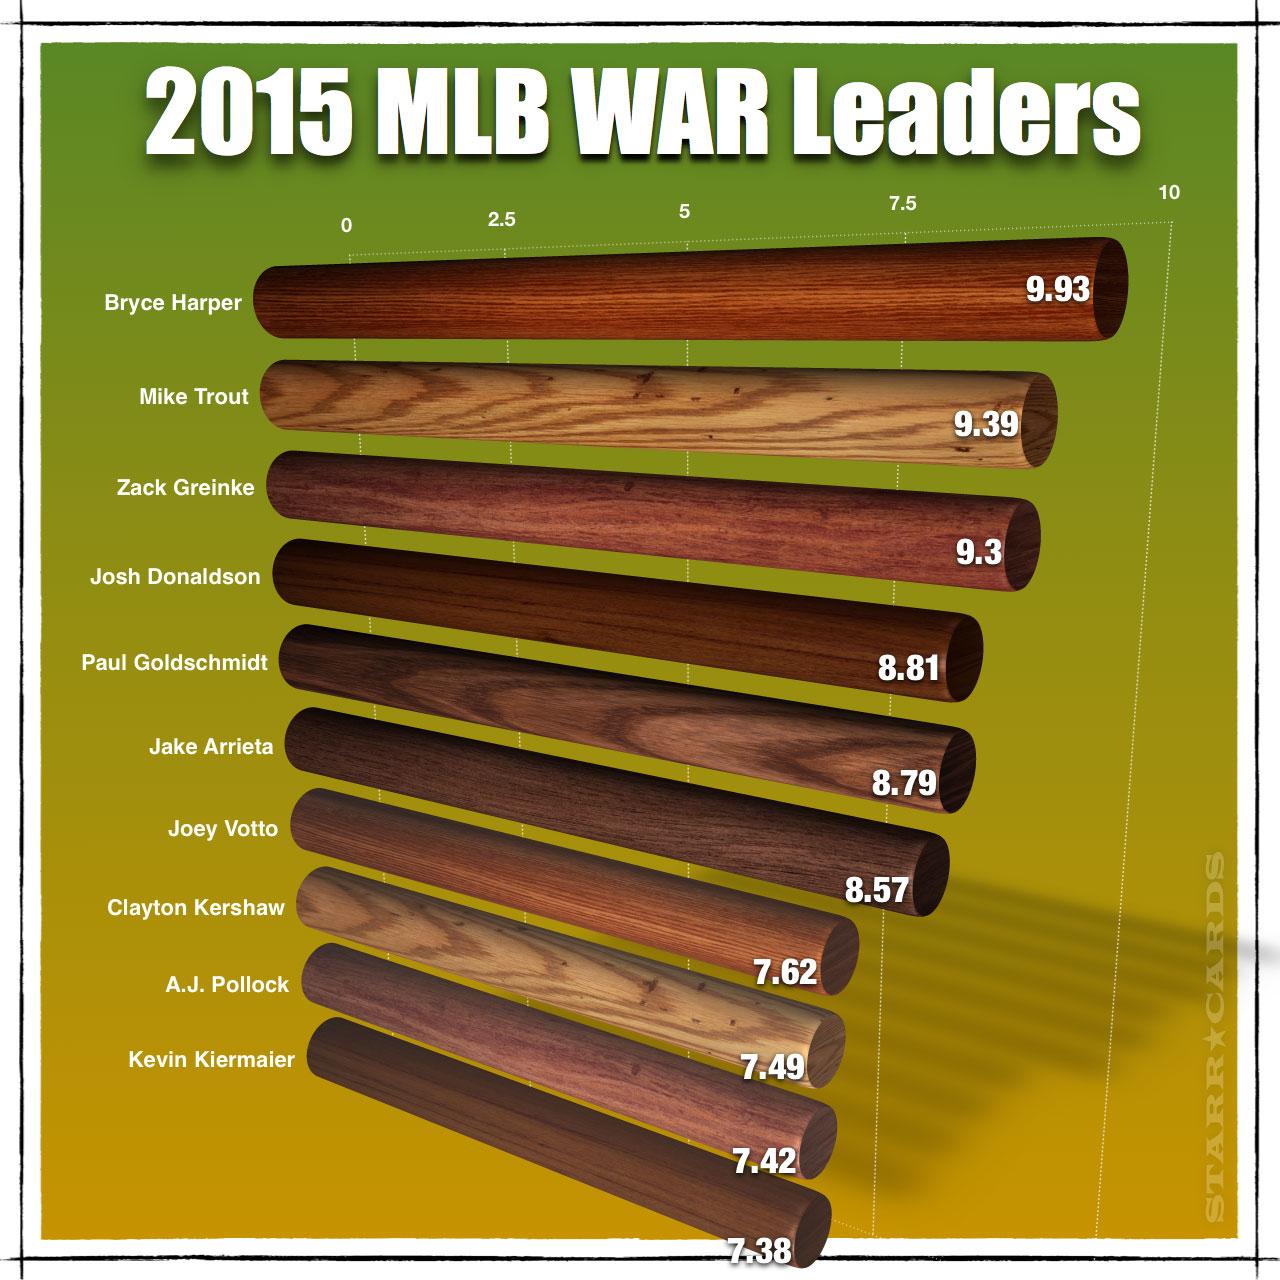 Bryce Harper and 2015 MLB WAR Leaders